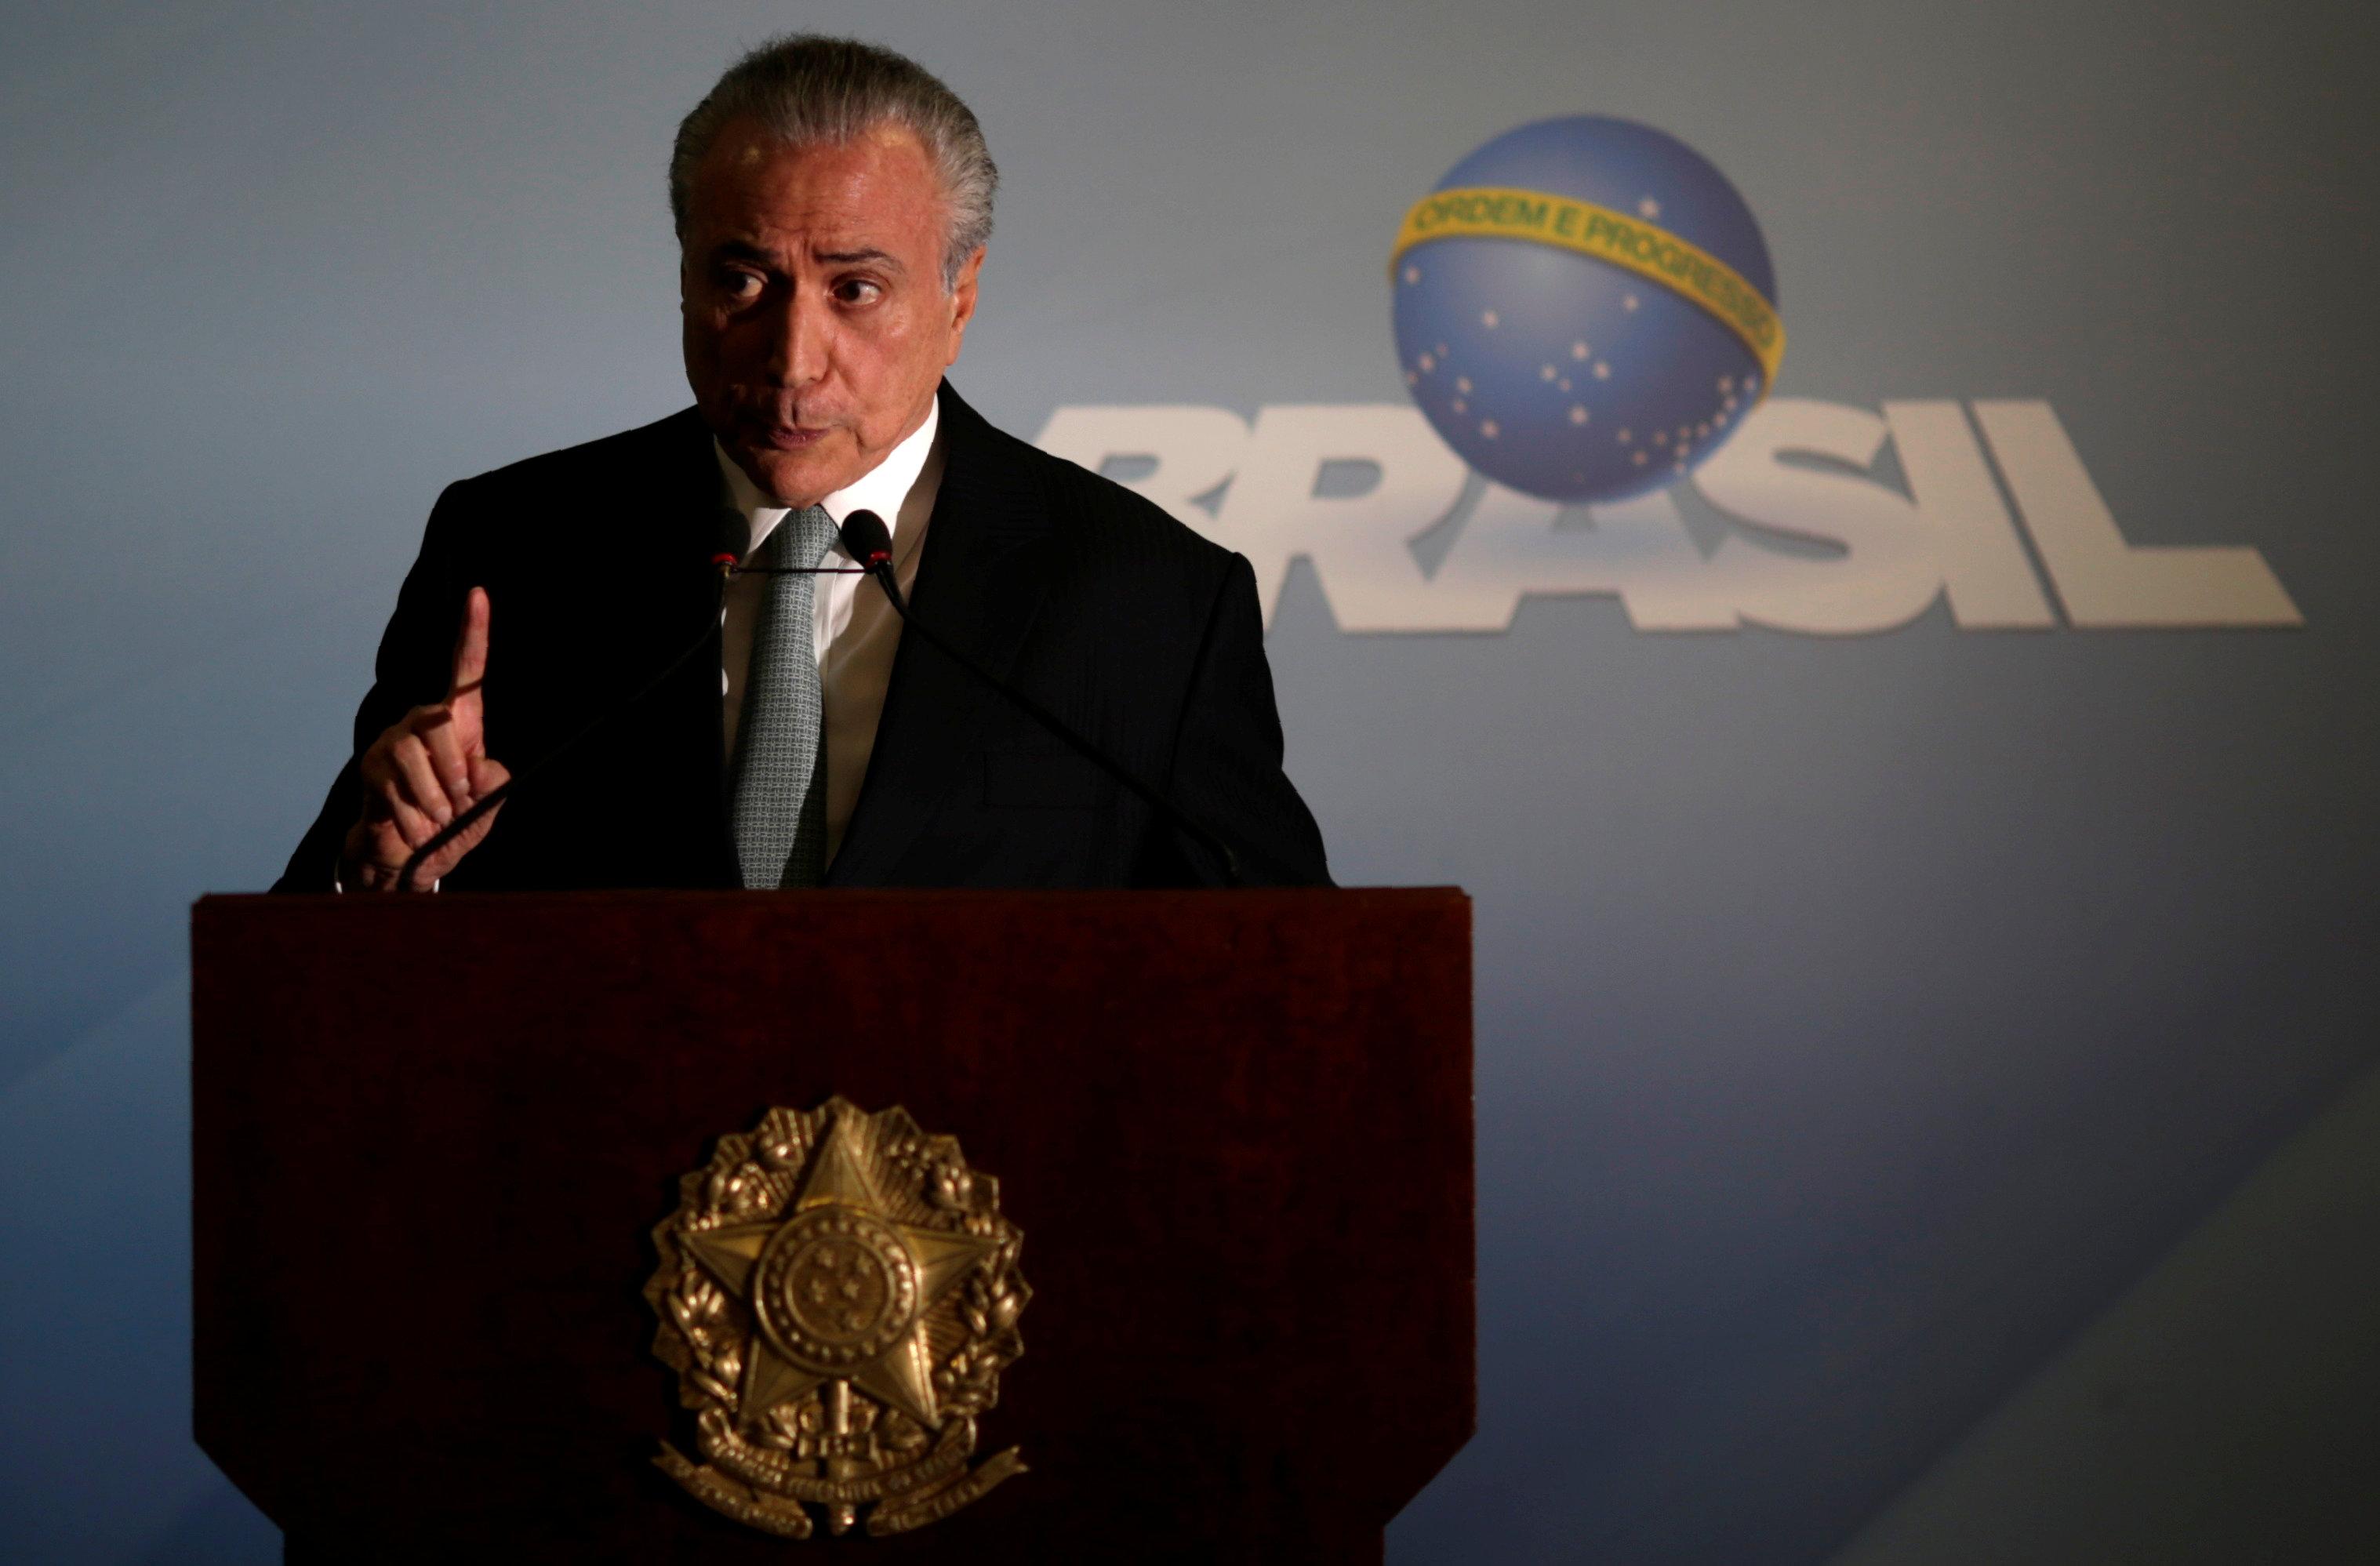 Brazil's President Michel Temer speaks at the Planalto Palace in Brasilia, Brazil on May 18, 2017. (REUTERS/Ueslei Marcelino)